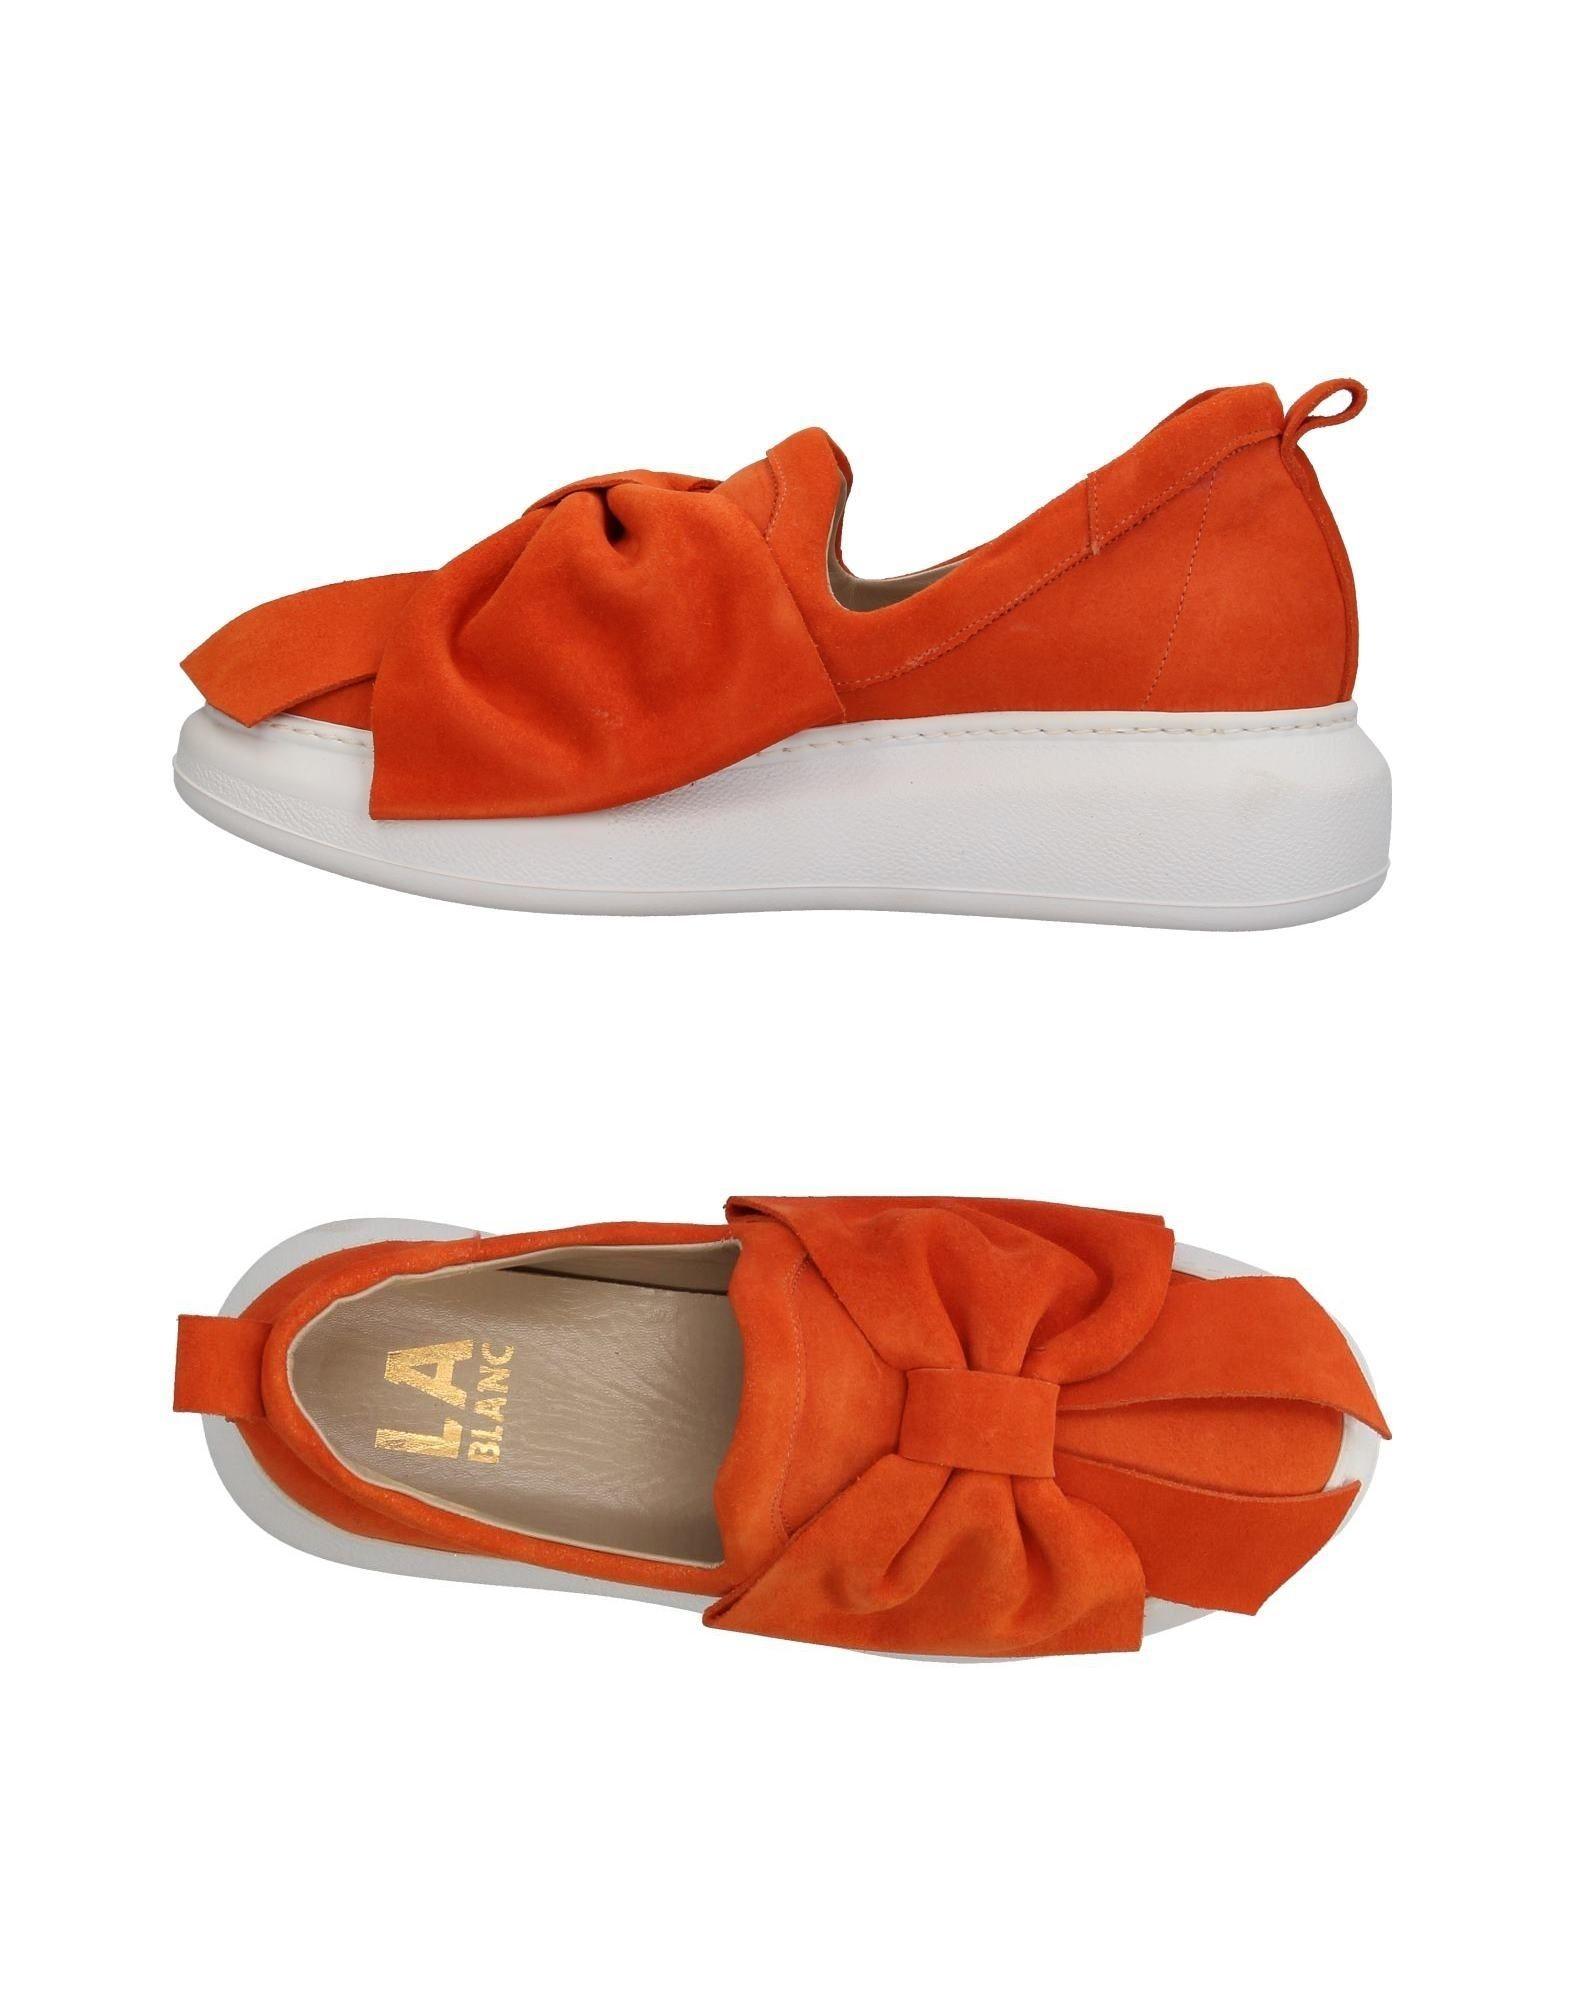 Sneakers La Blanc Femme - Sneakers La Blanc sur